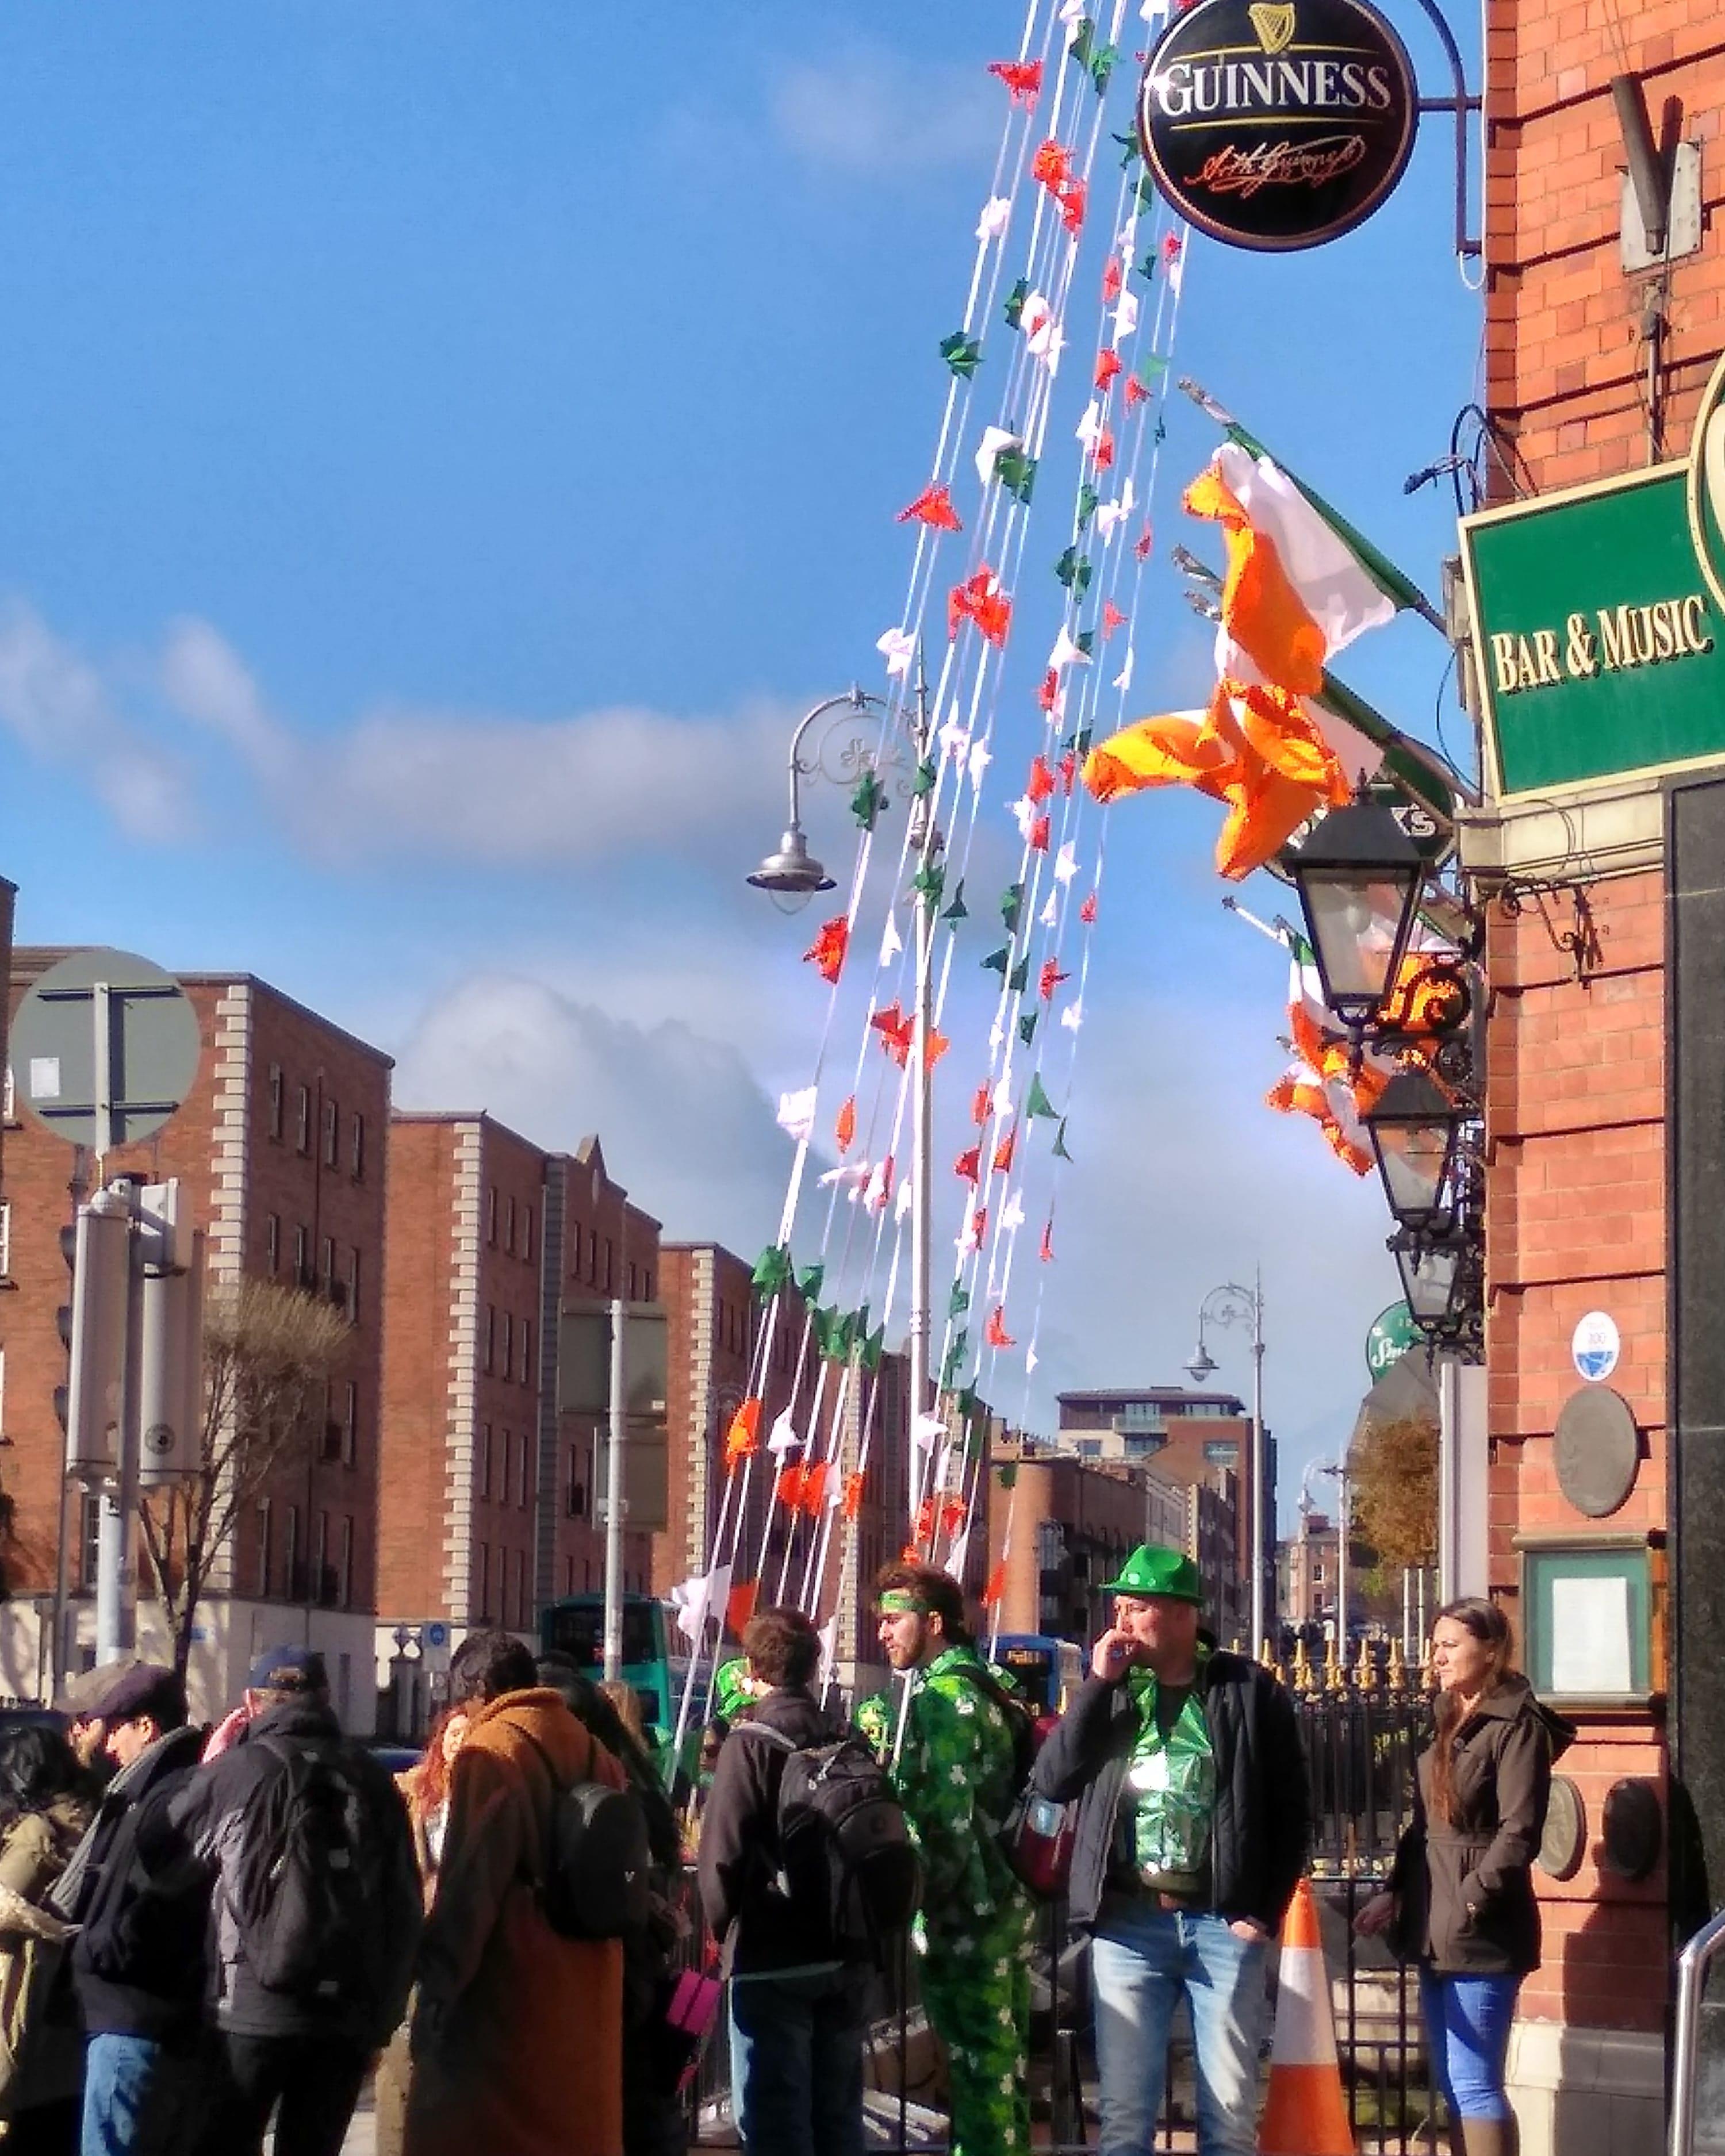 Vivir en Irlanda 10 razones